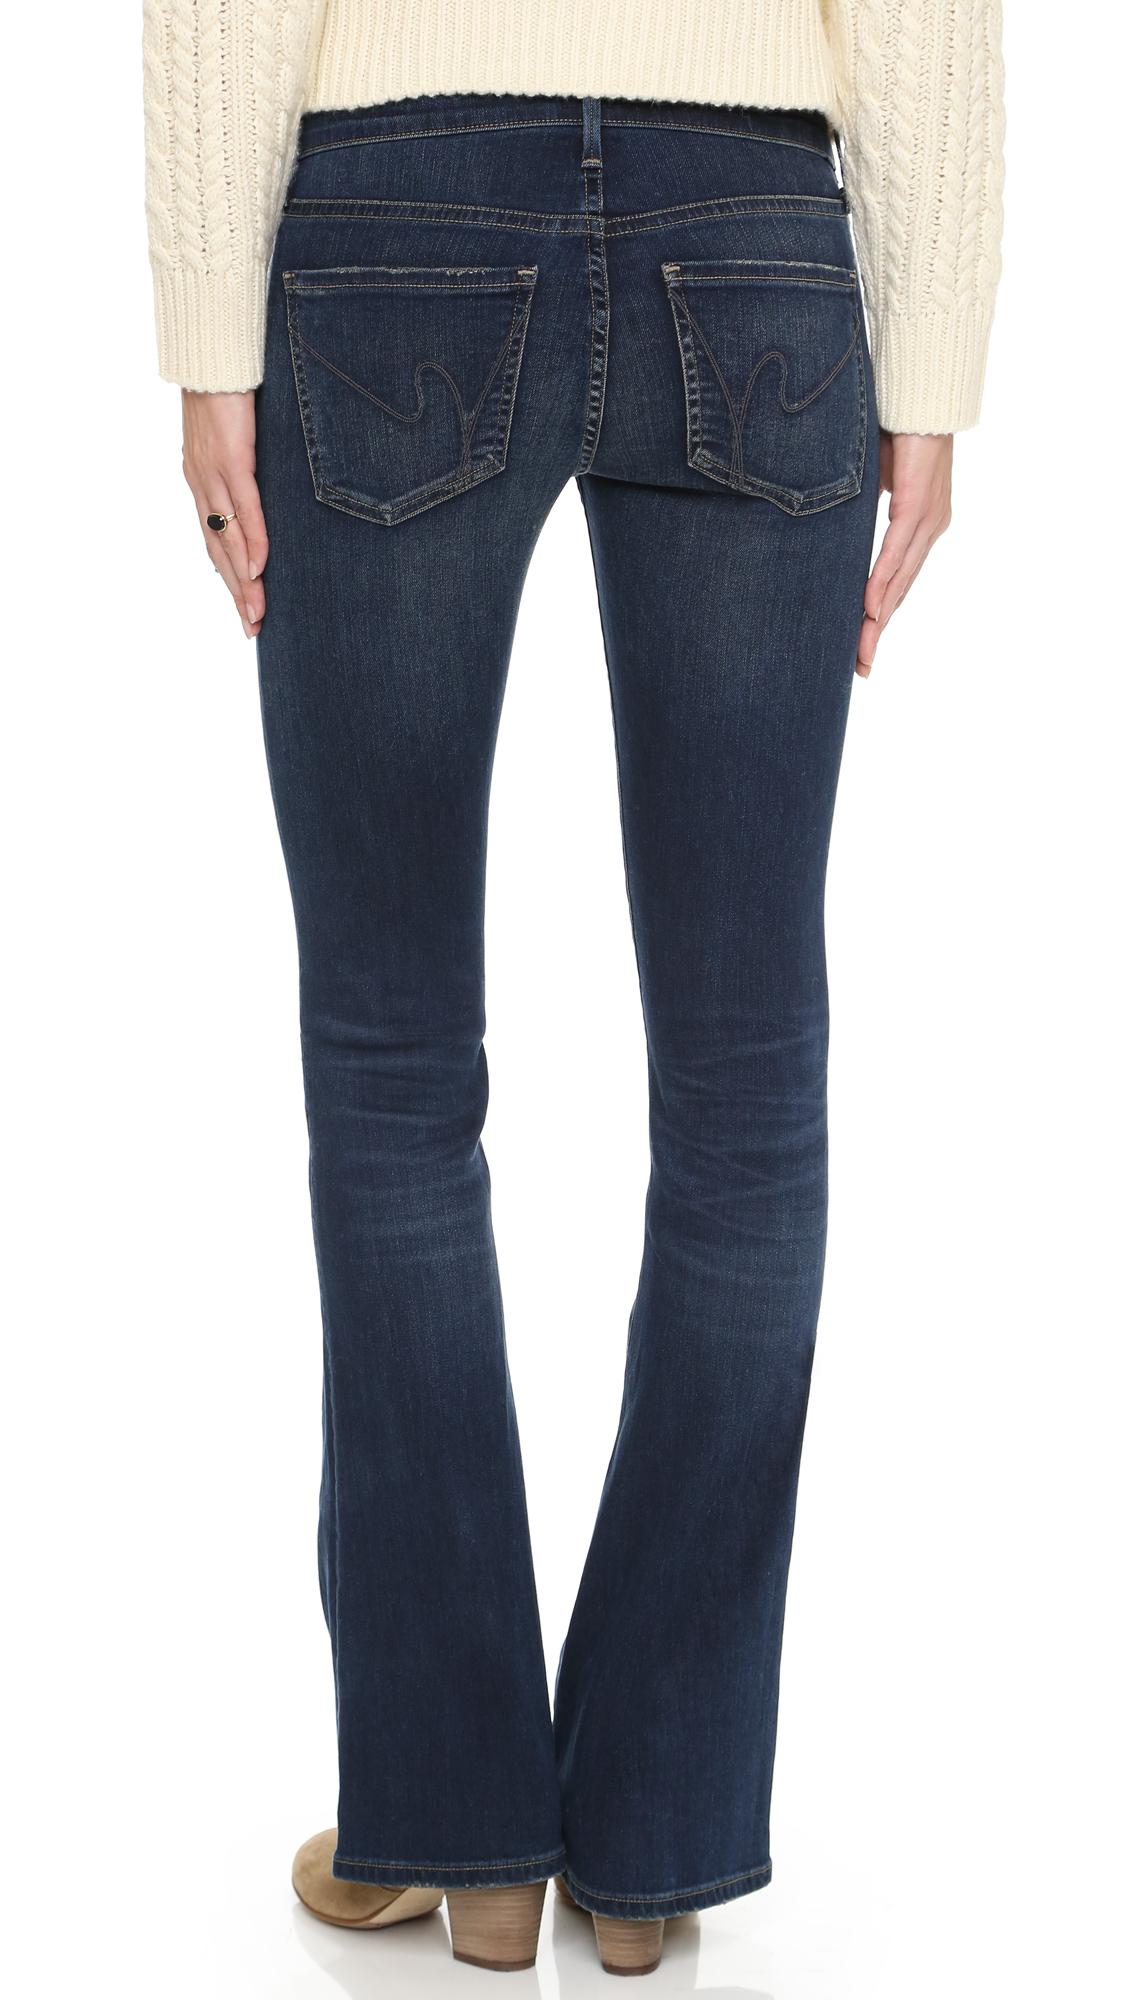 citizens of humanity emmanuelle slim boot cut jeans in. Black Bedroom Furniture Sets. Home Design Ideas